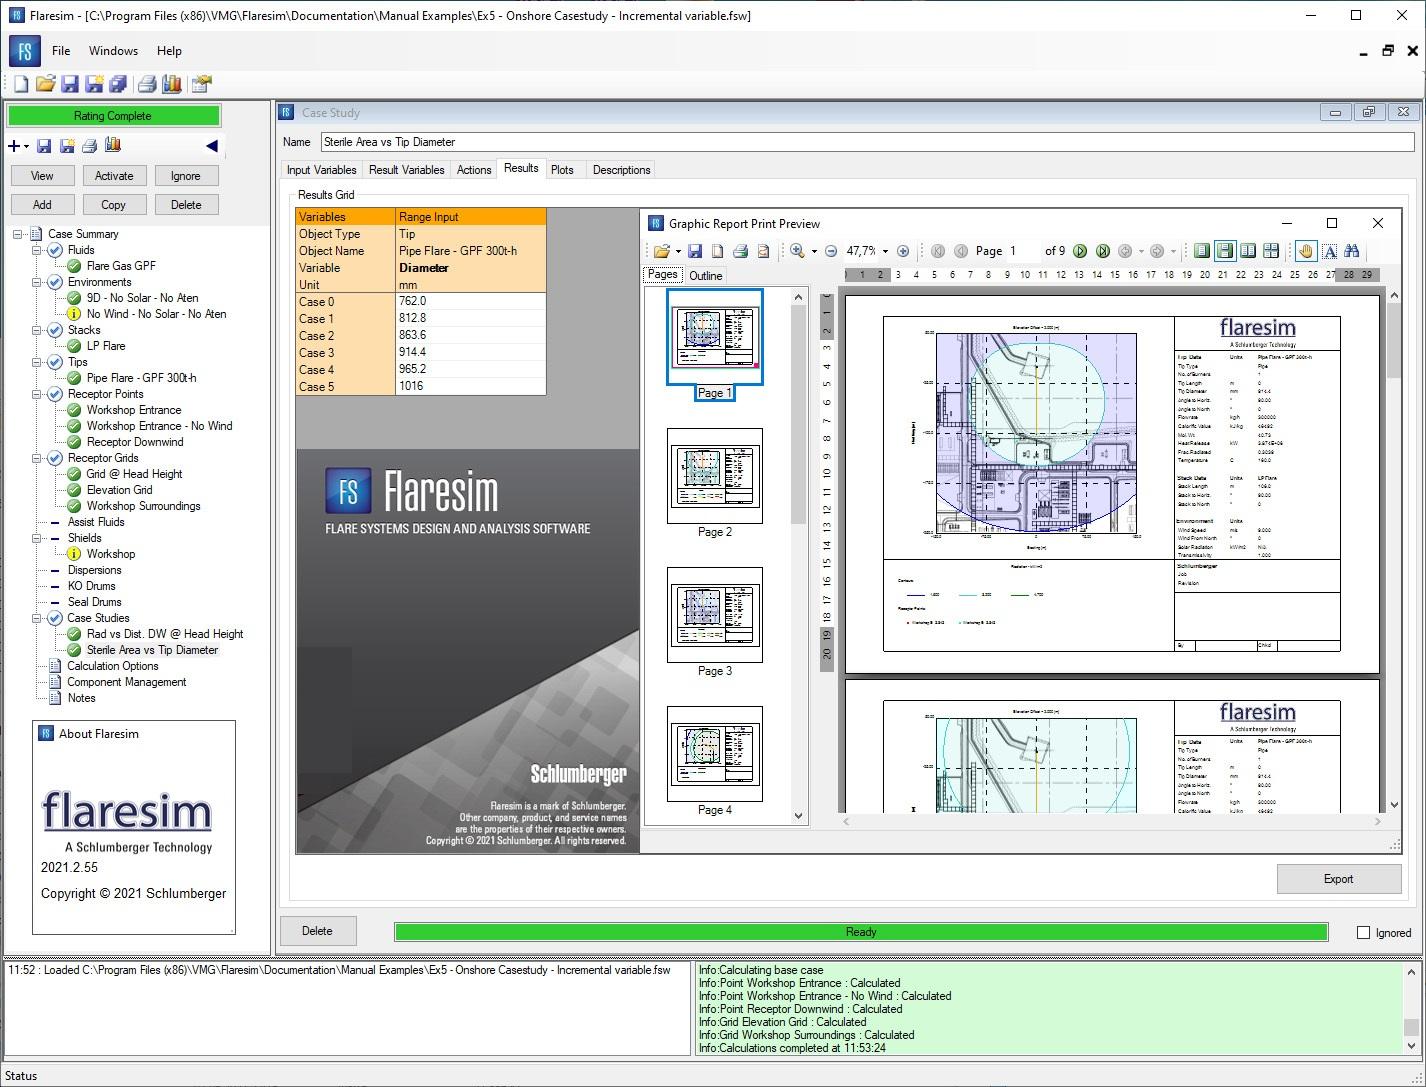 Working with Schlumberger (ex. Softbits) Flaresim 2021.2.55 full